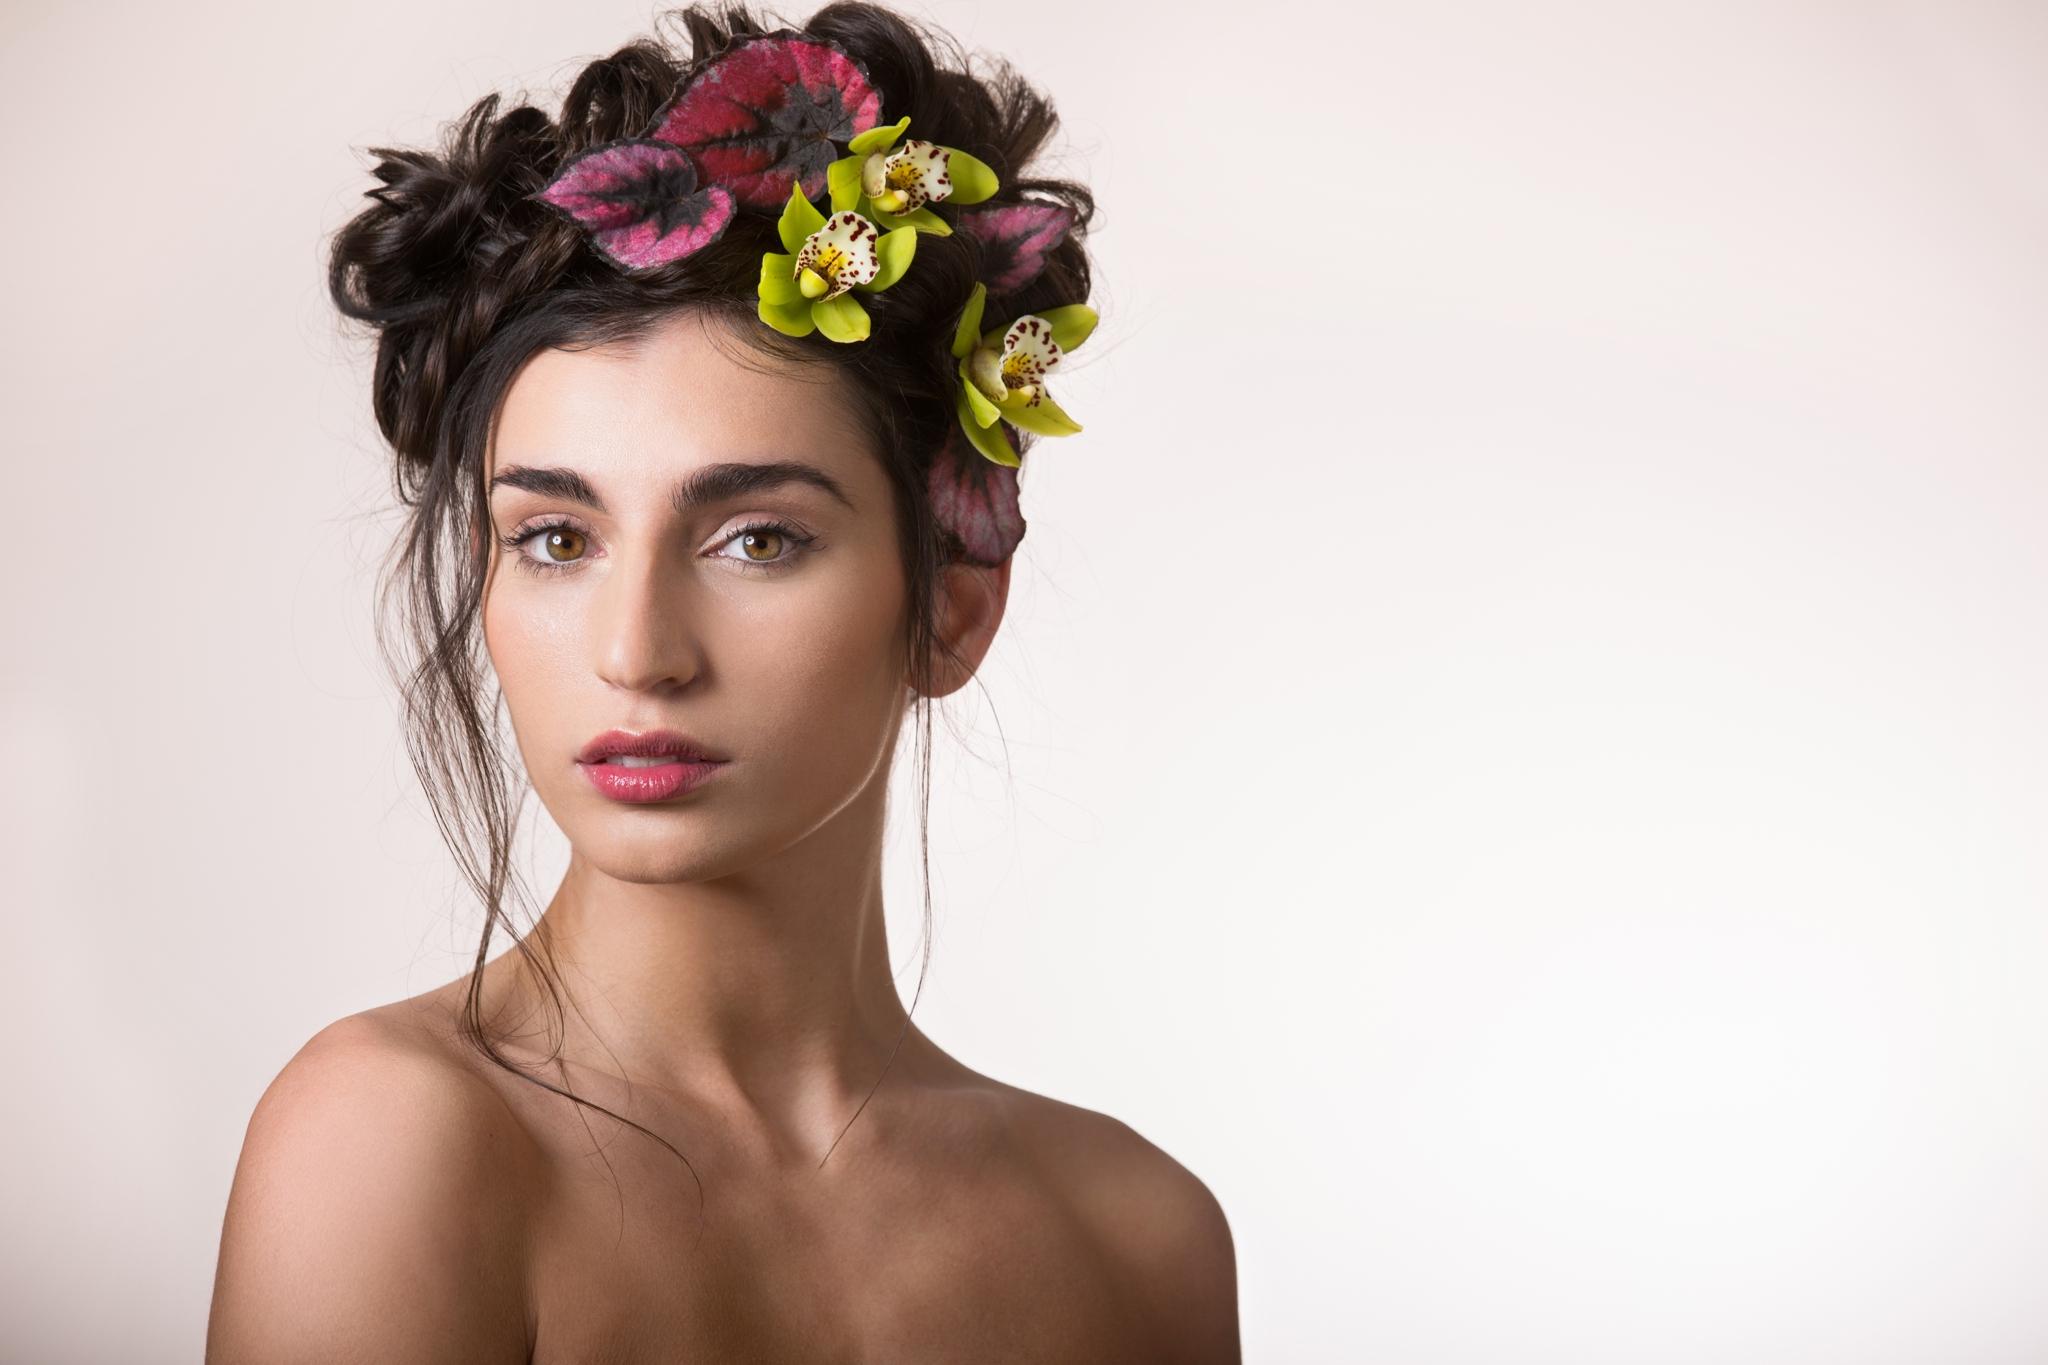 UniqueFlorals_BeautyFlowers_MichelleGirardPhotography03.jpg